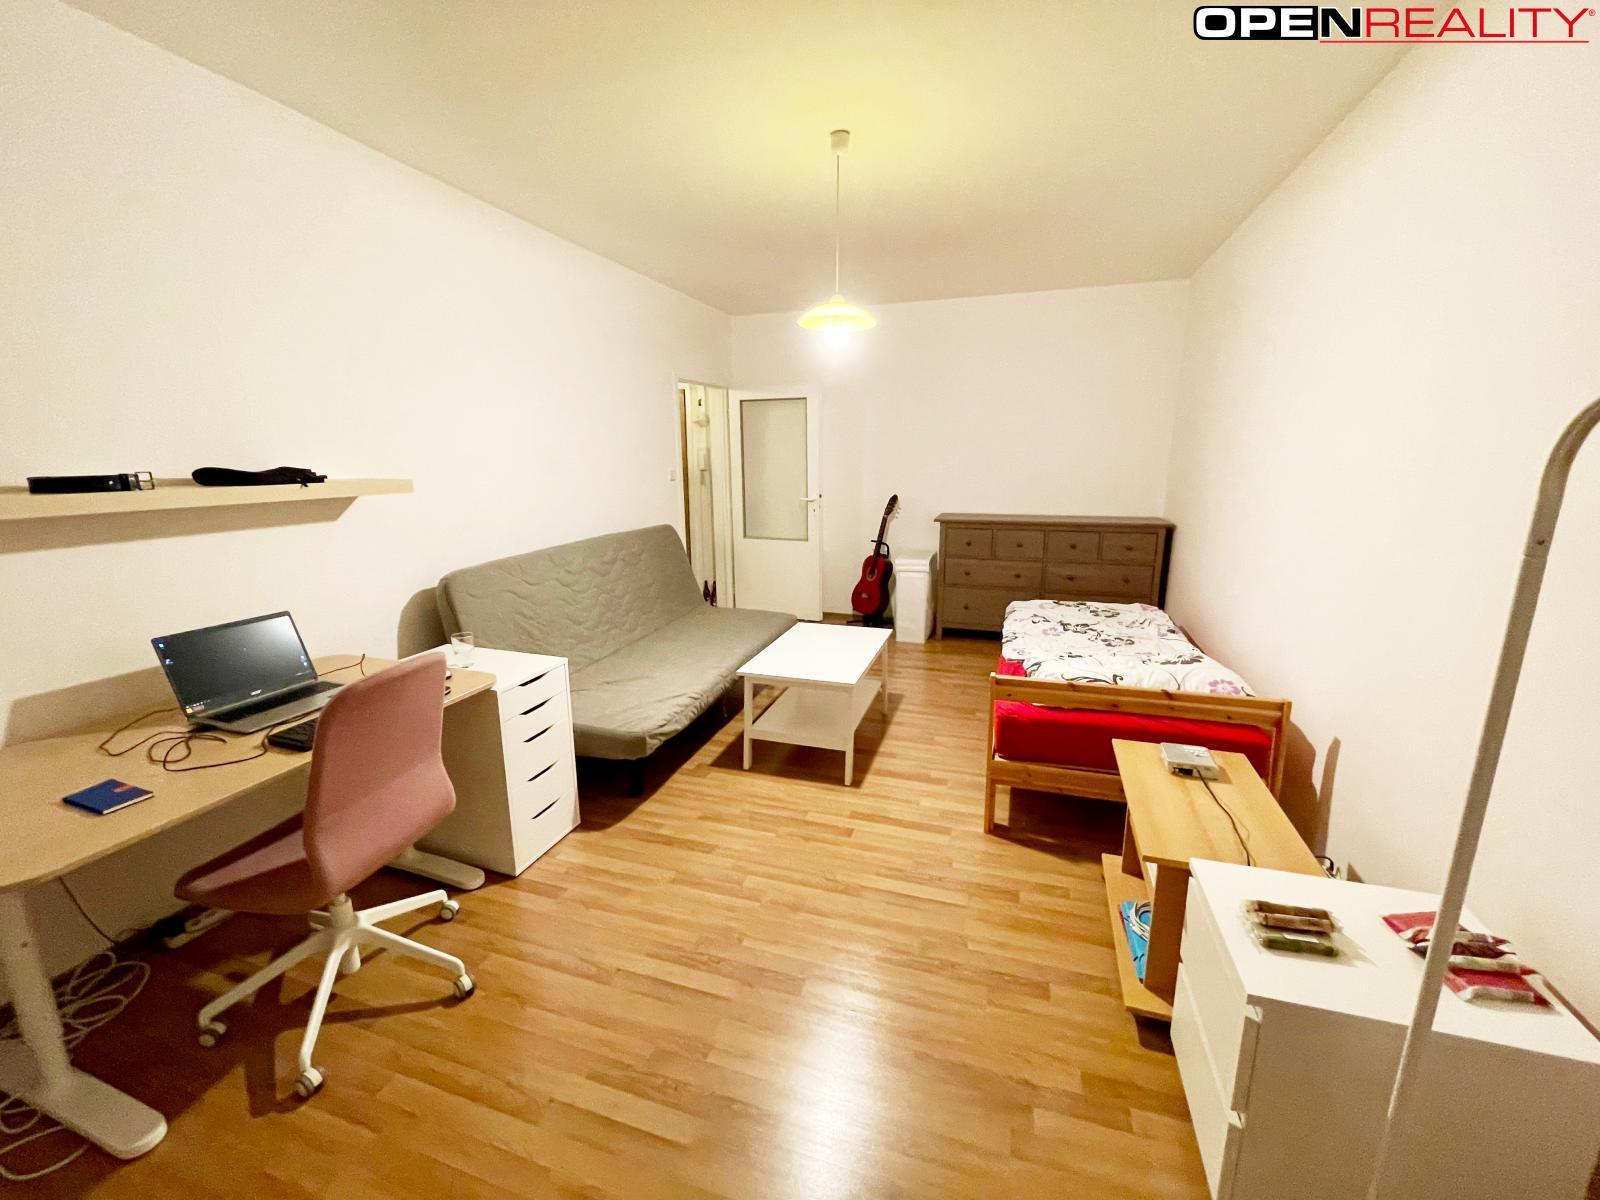 Pronájem bytu 1+1 40m2, Brno-Bystrc